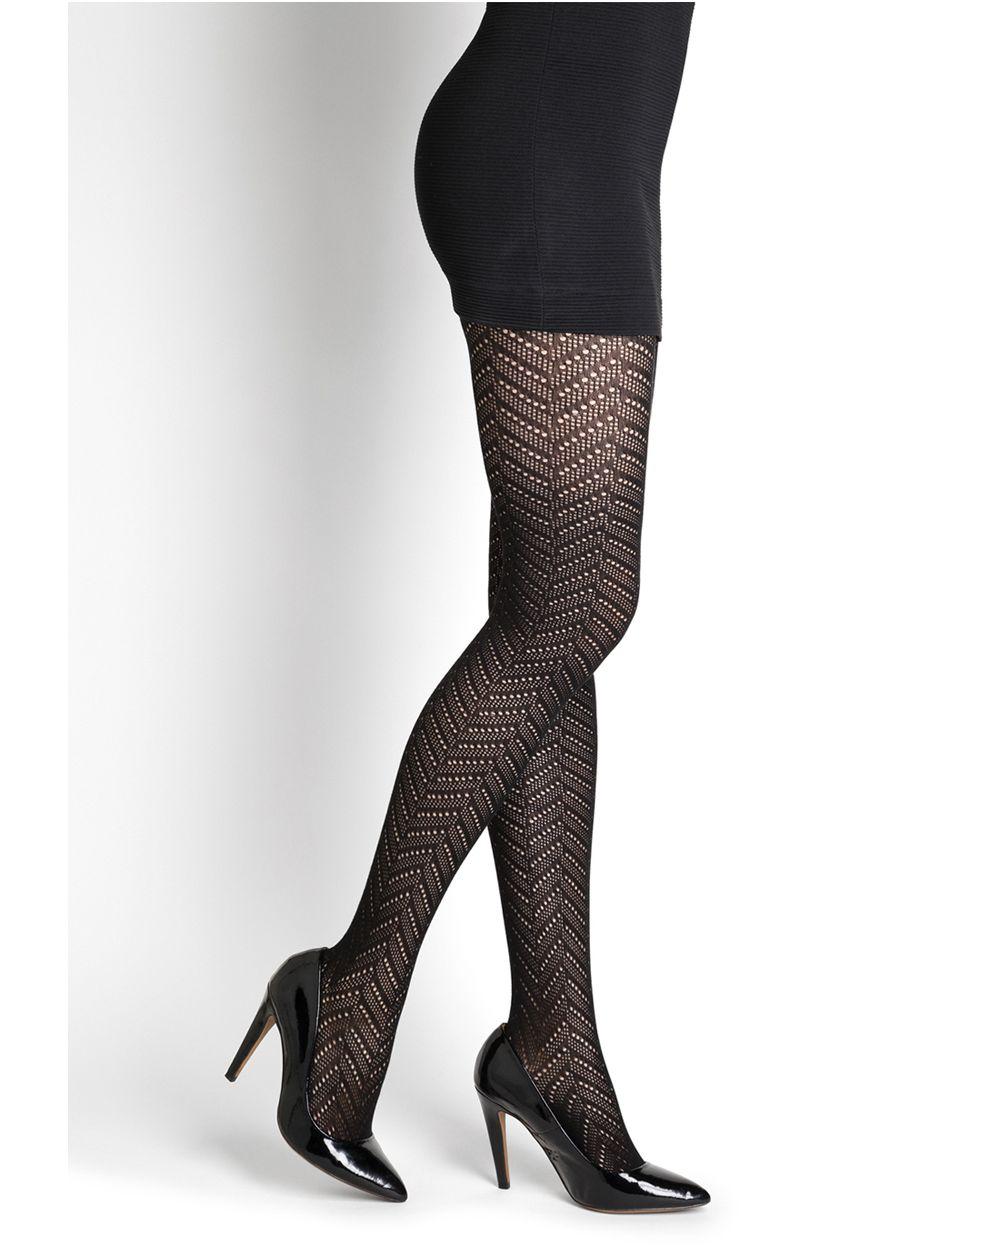 Herringbone lace cotton tights